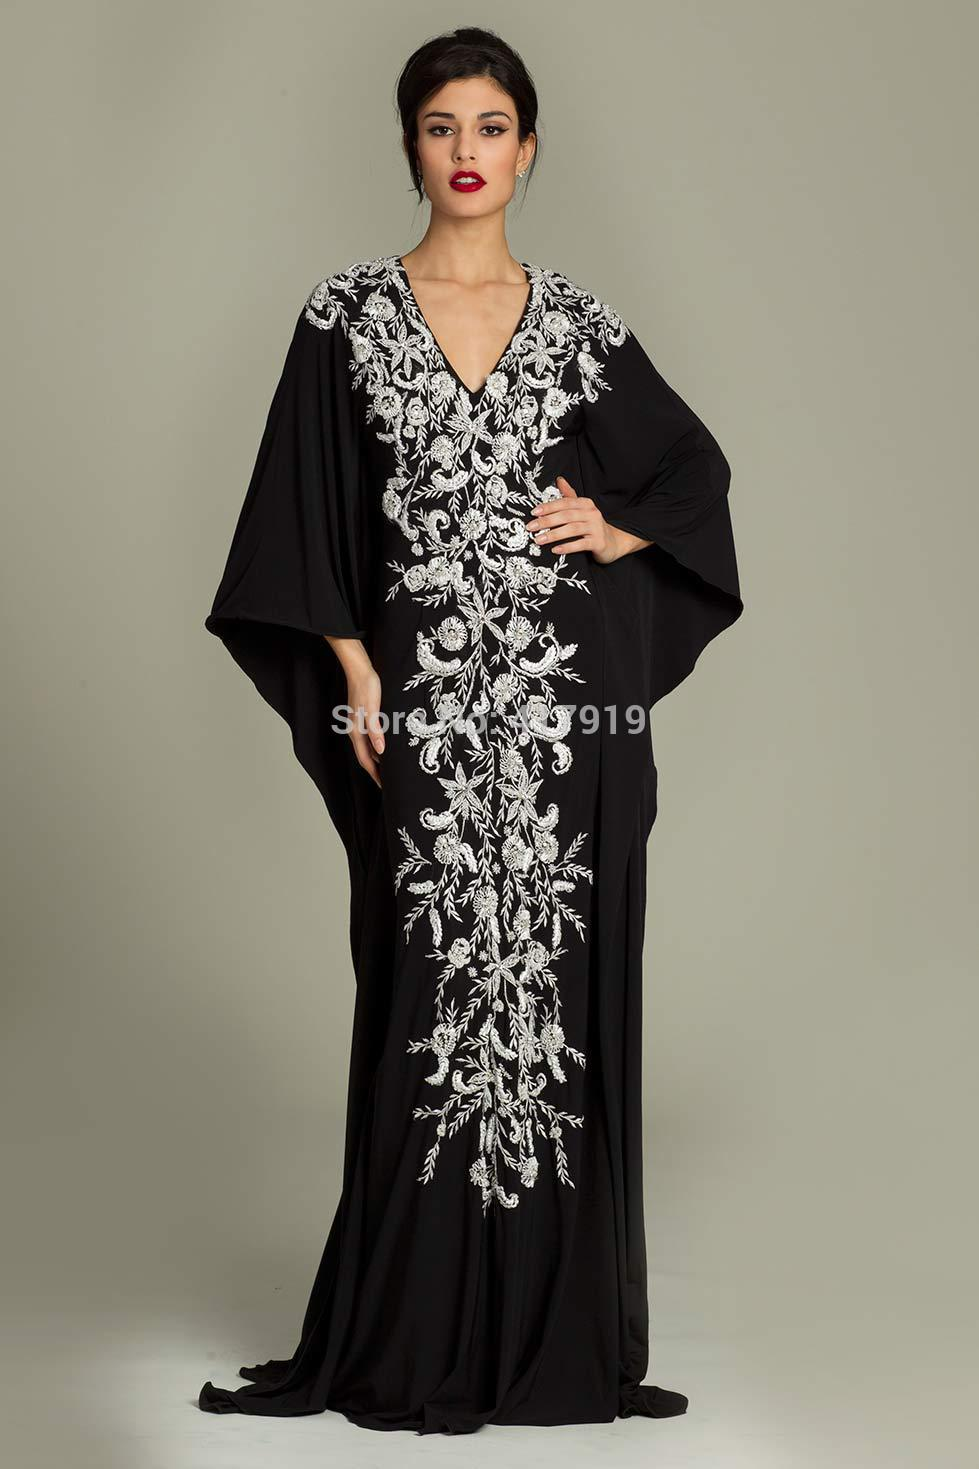 long sleeve evening dress plus size photo - 1